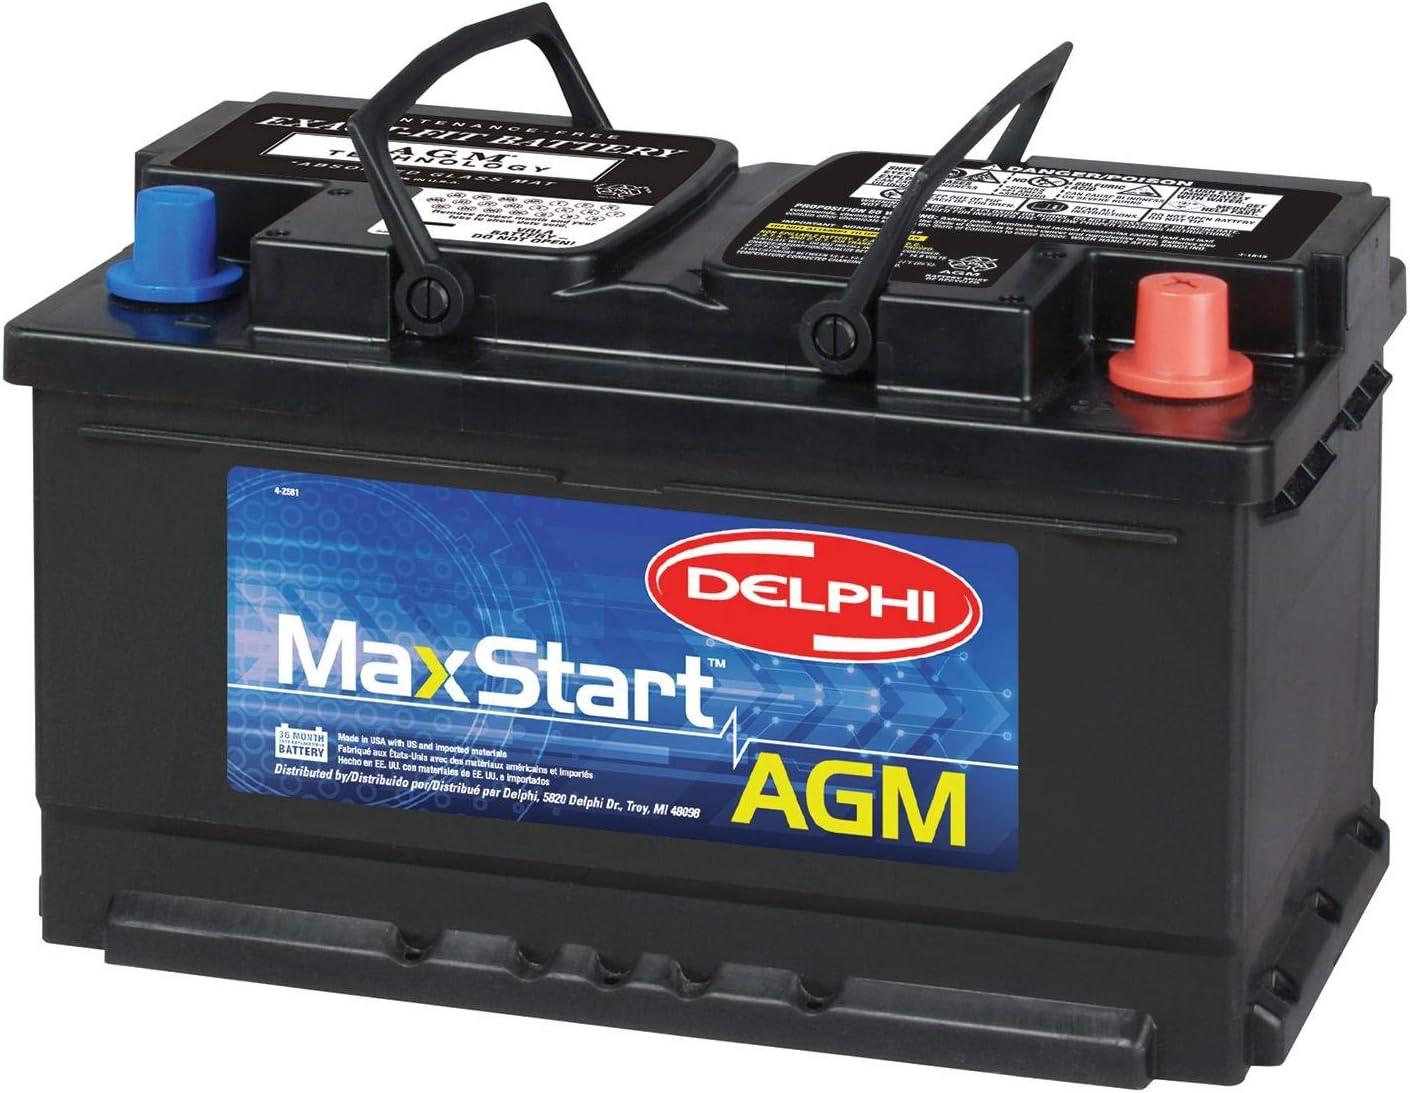 Delphi MaxStart AGM Premium Automotive Battery